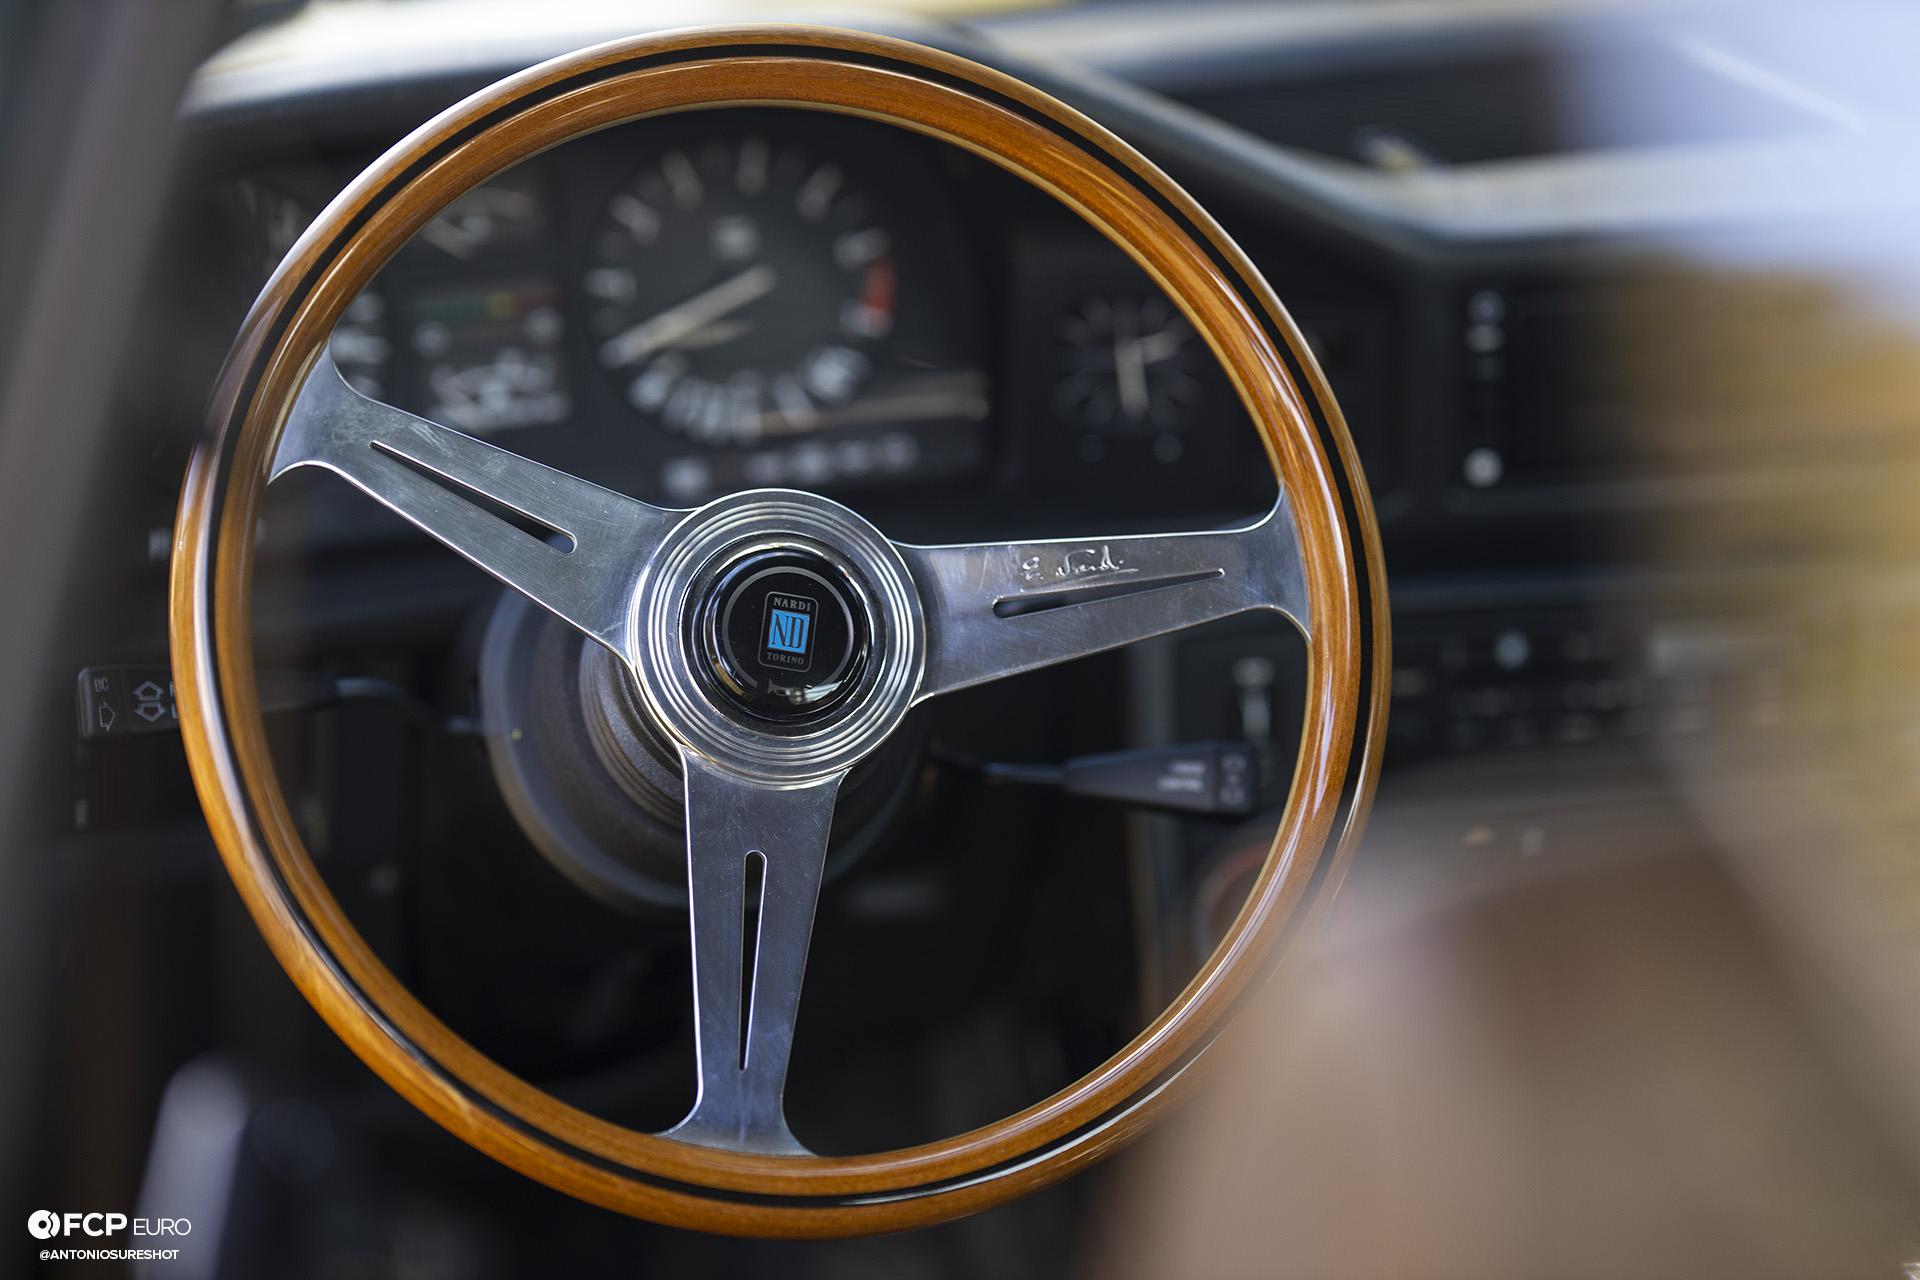 BMW E28 M60B40 V8 Engine Swap 535i Nardi Steering Wheel